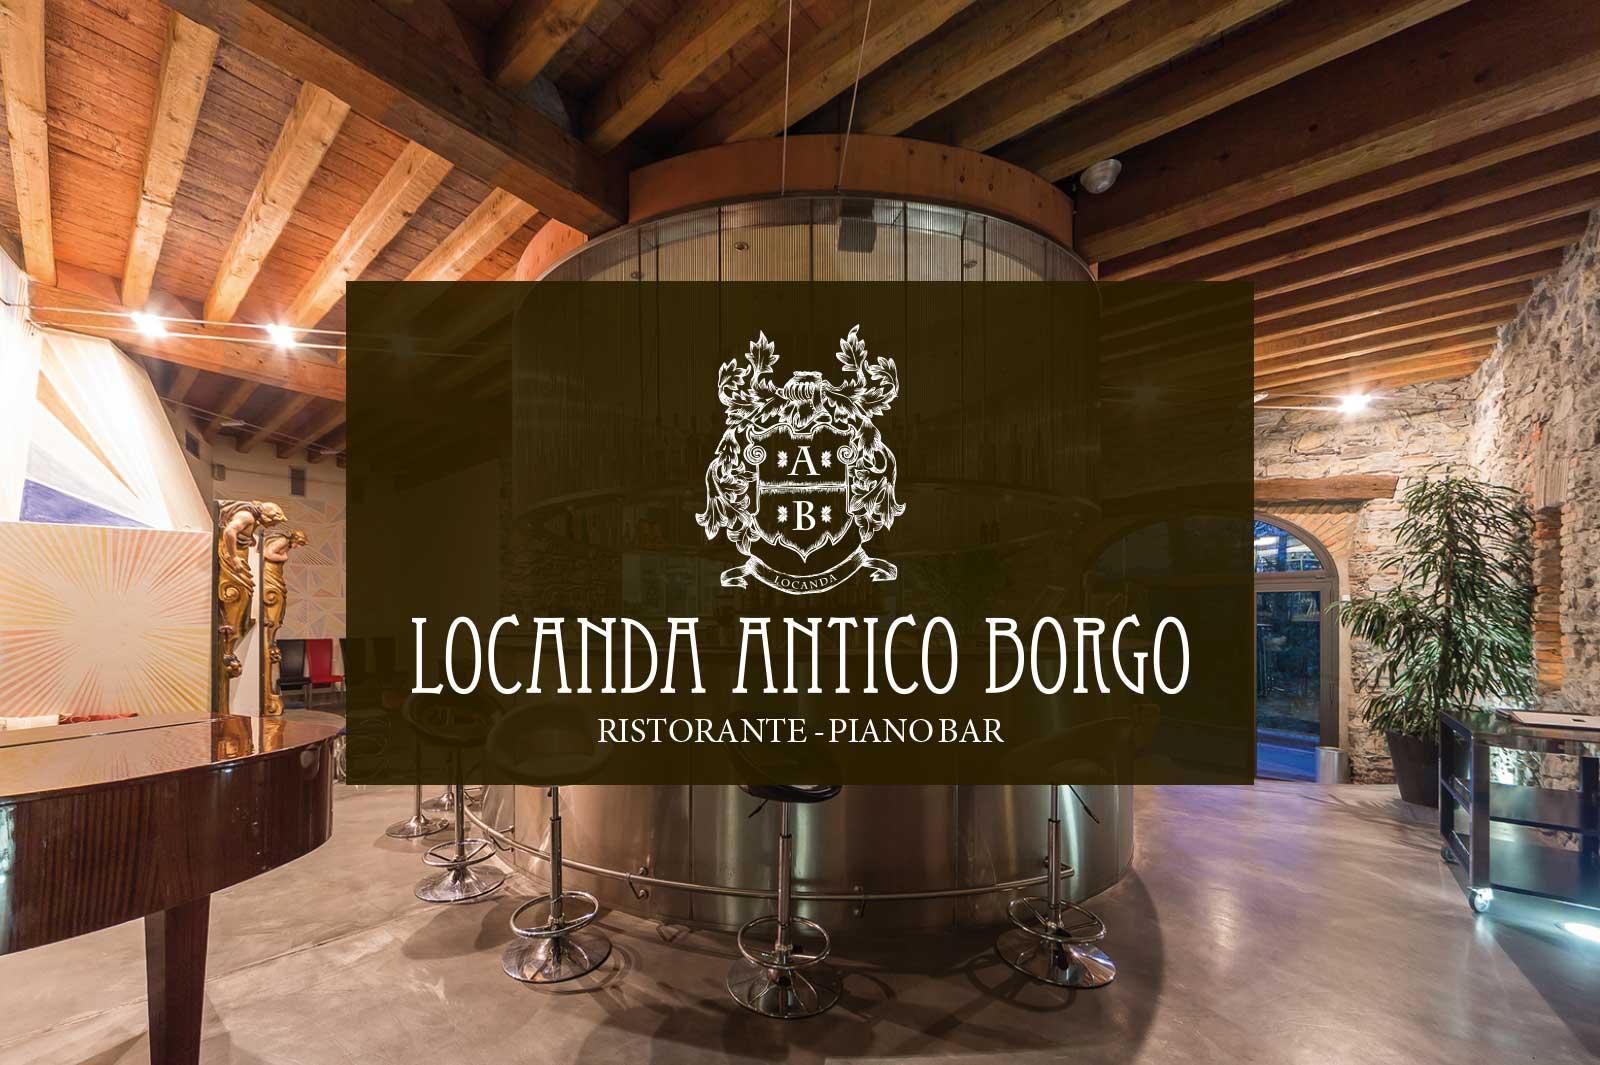 Antico_borgo